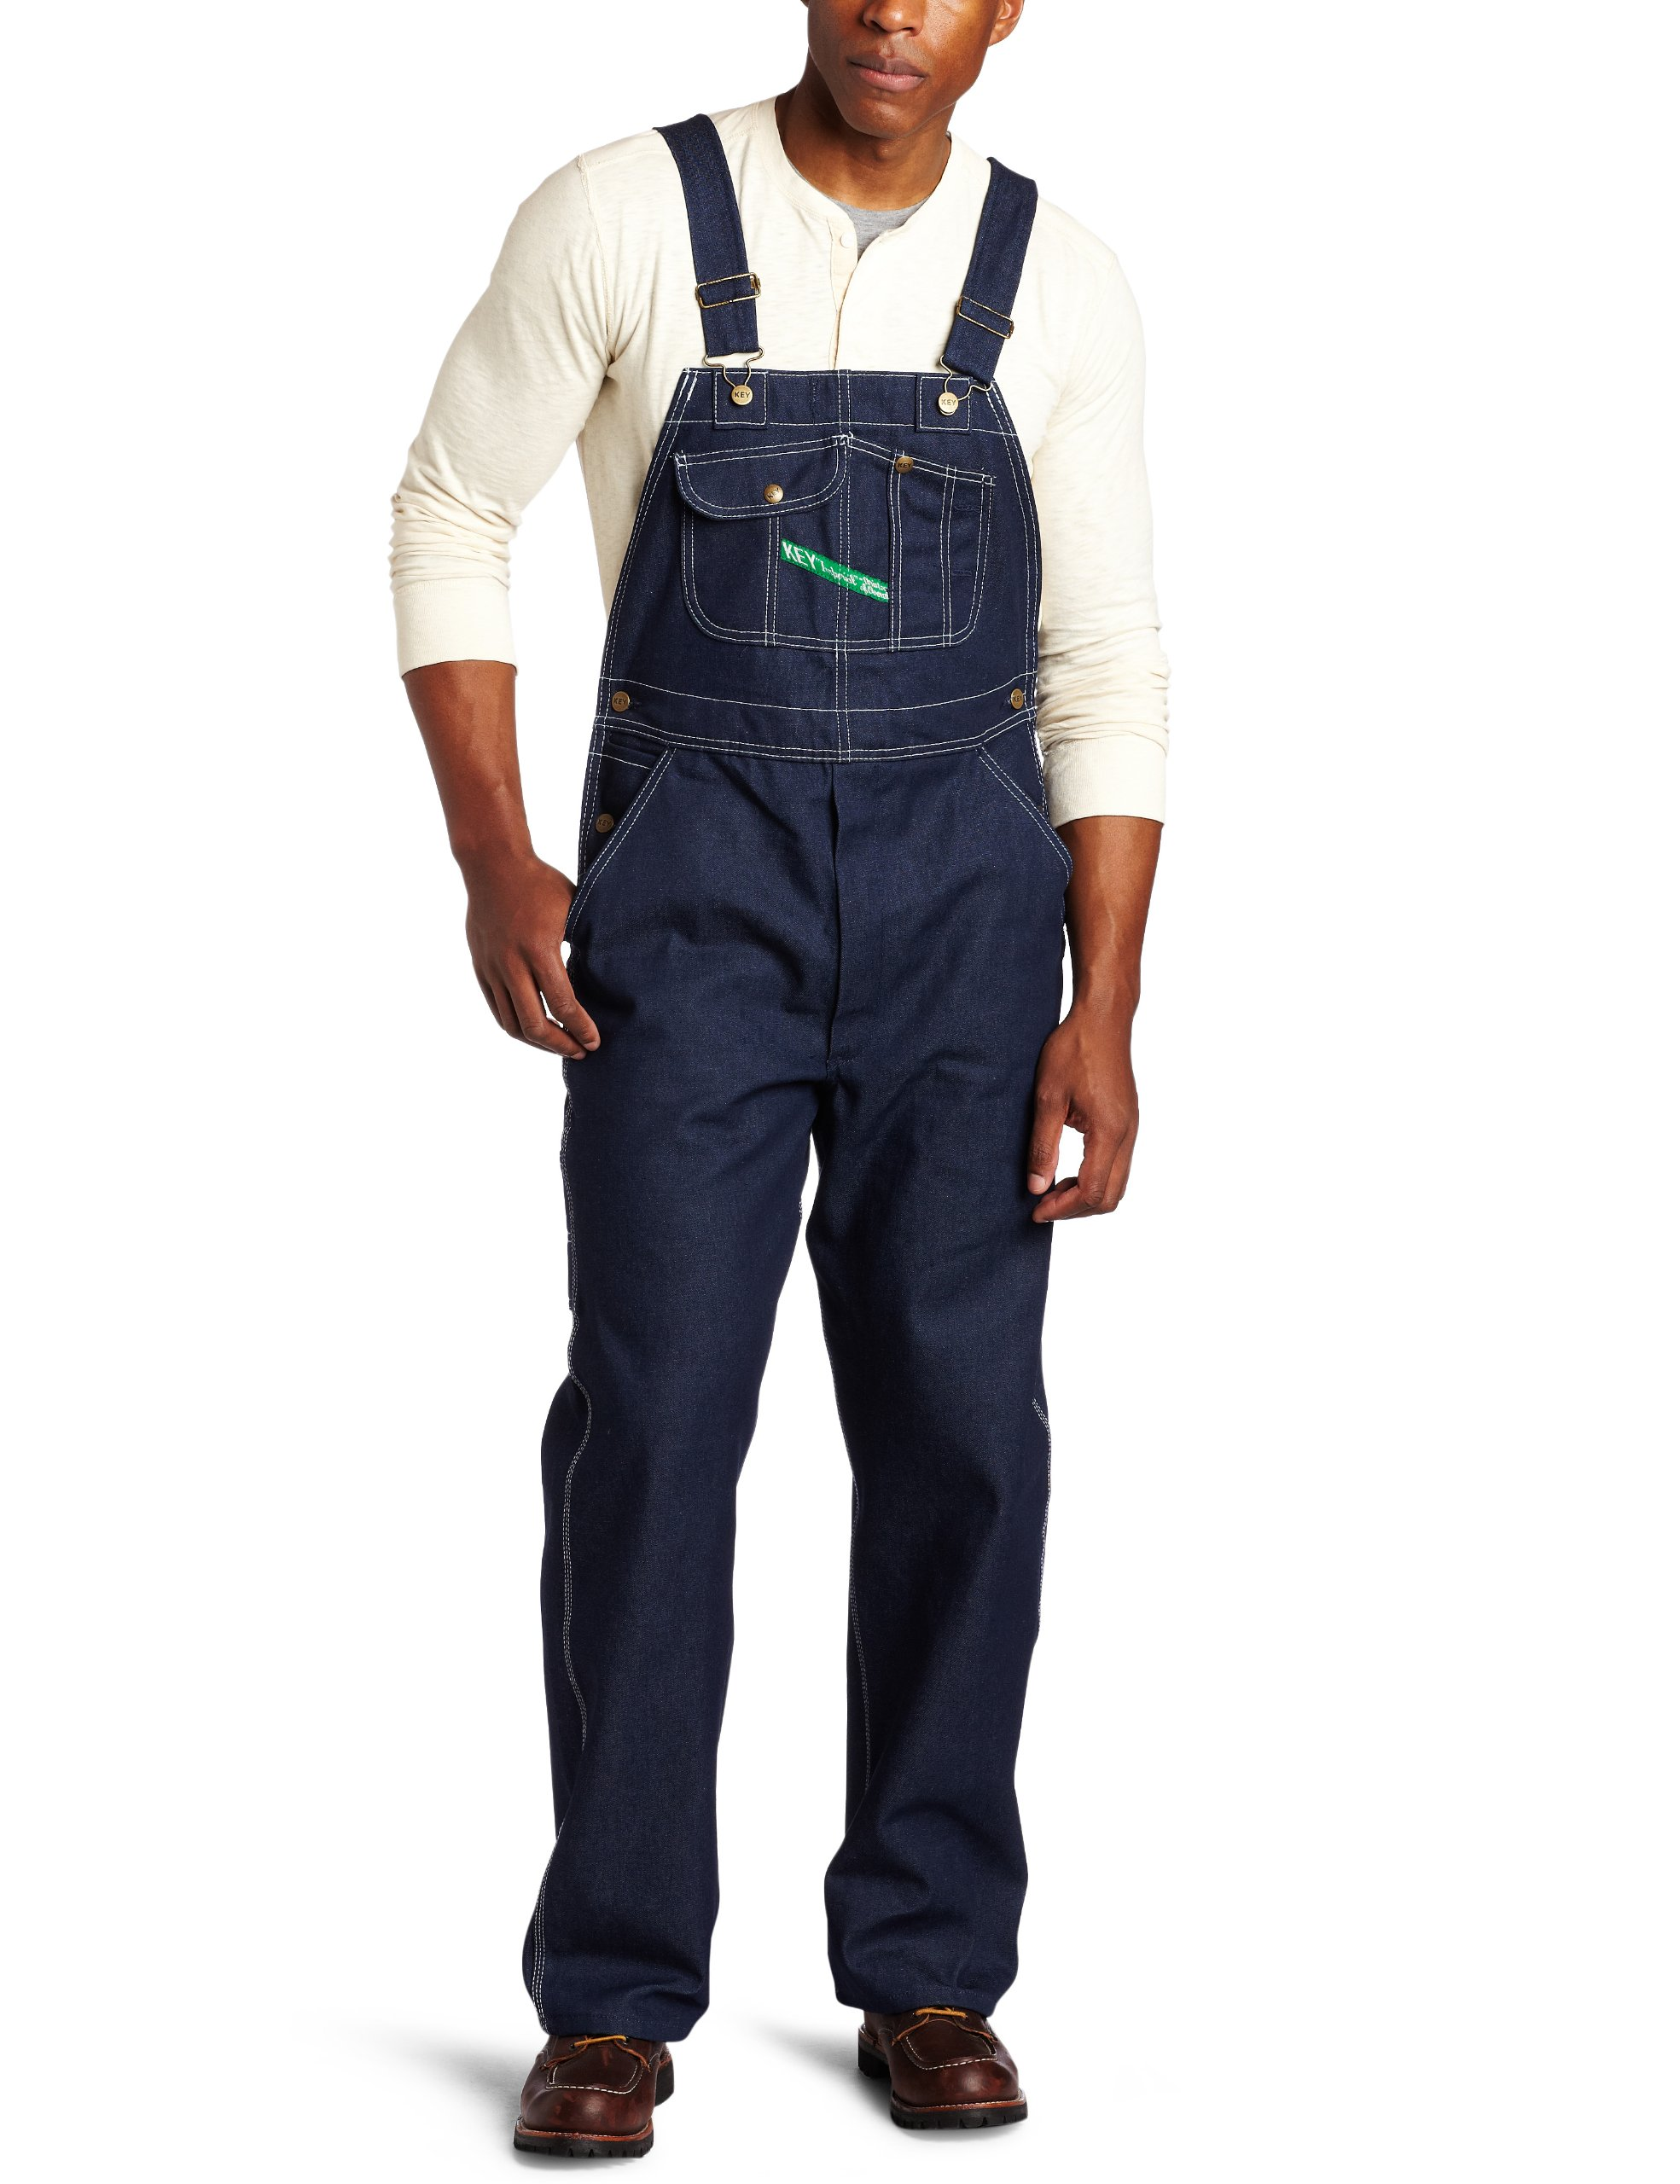 Key Apparel  Men's Garment Washed Zip Fly High Back Bib Overall - 38W x 32L - Indigo Denim